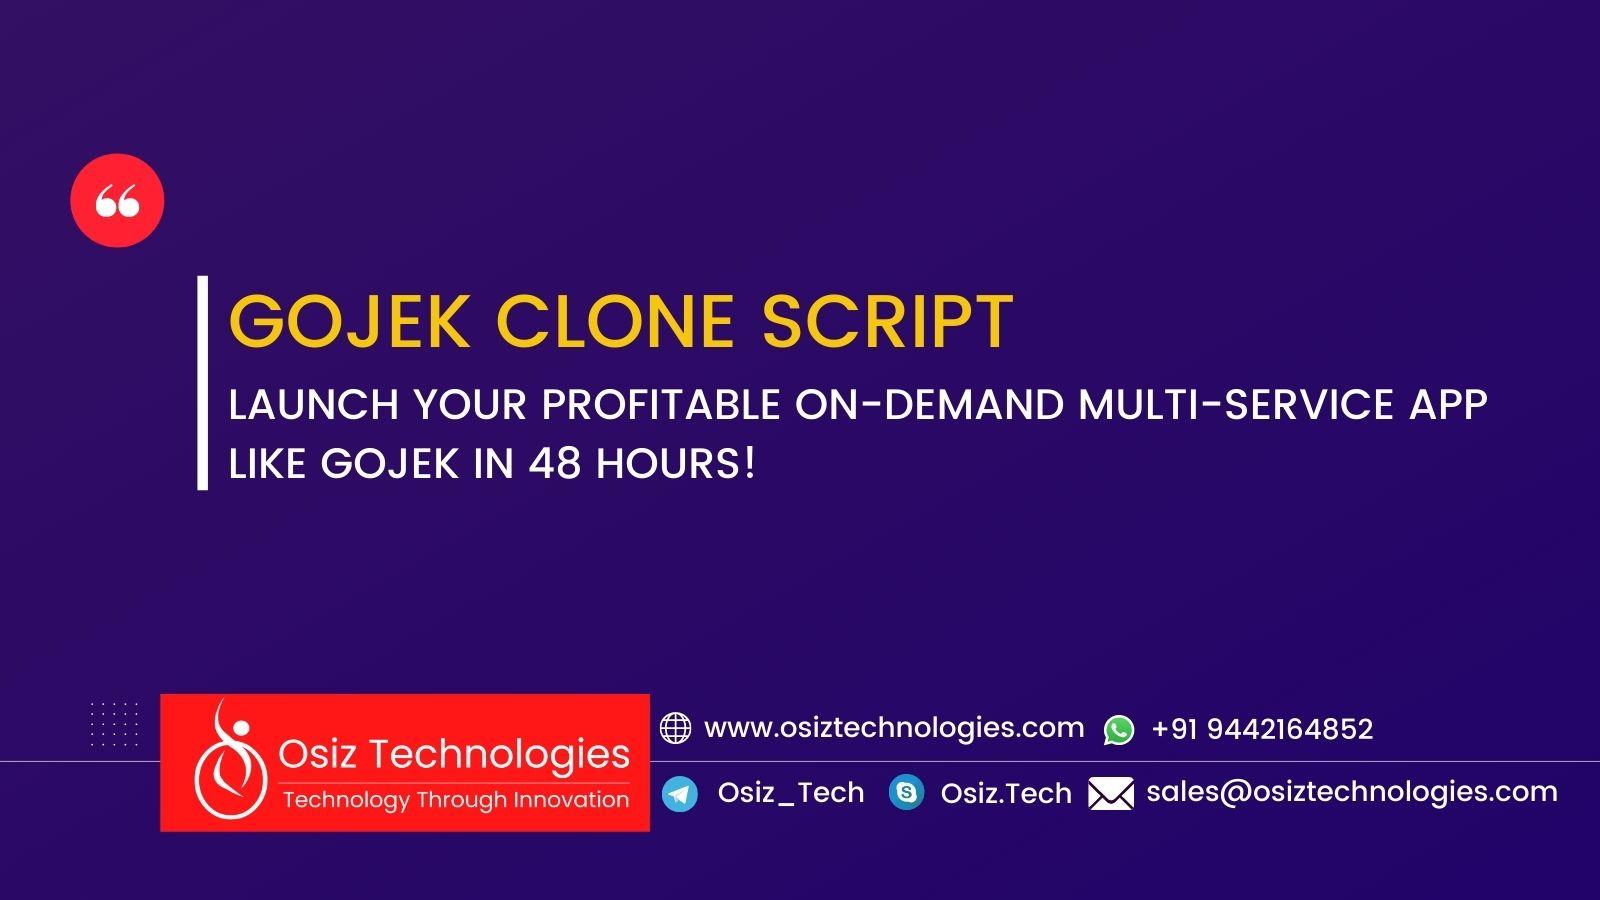 Gojek Clone Script - Launch Your Profitable On-Demand Multi-Service App Like Gojek in 48 Hours!